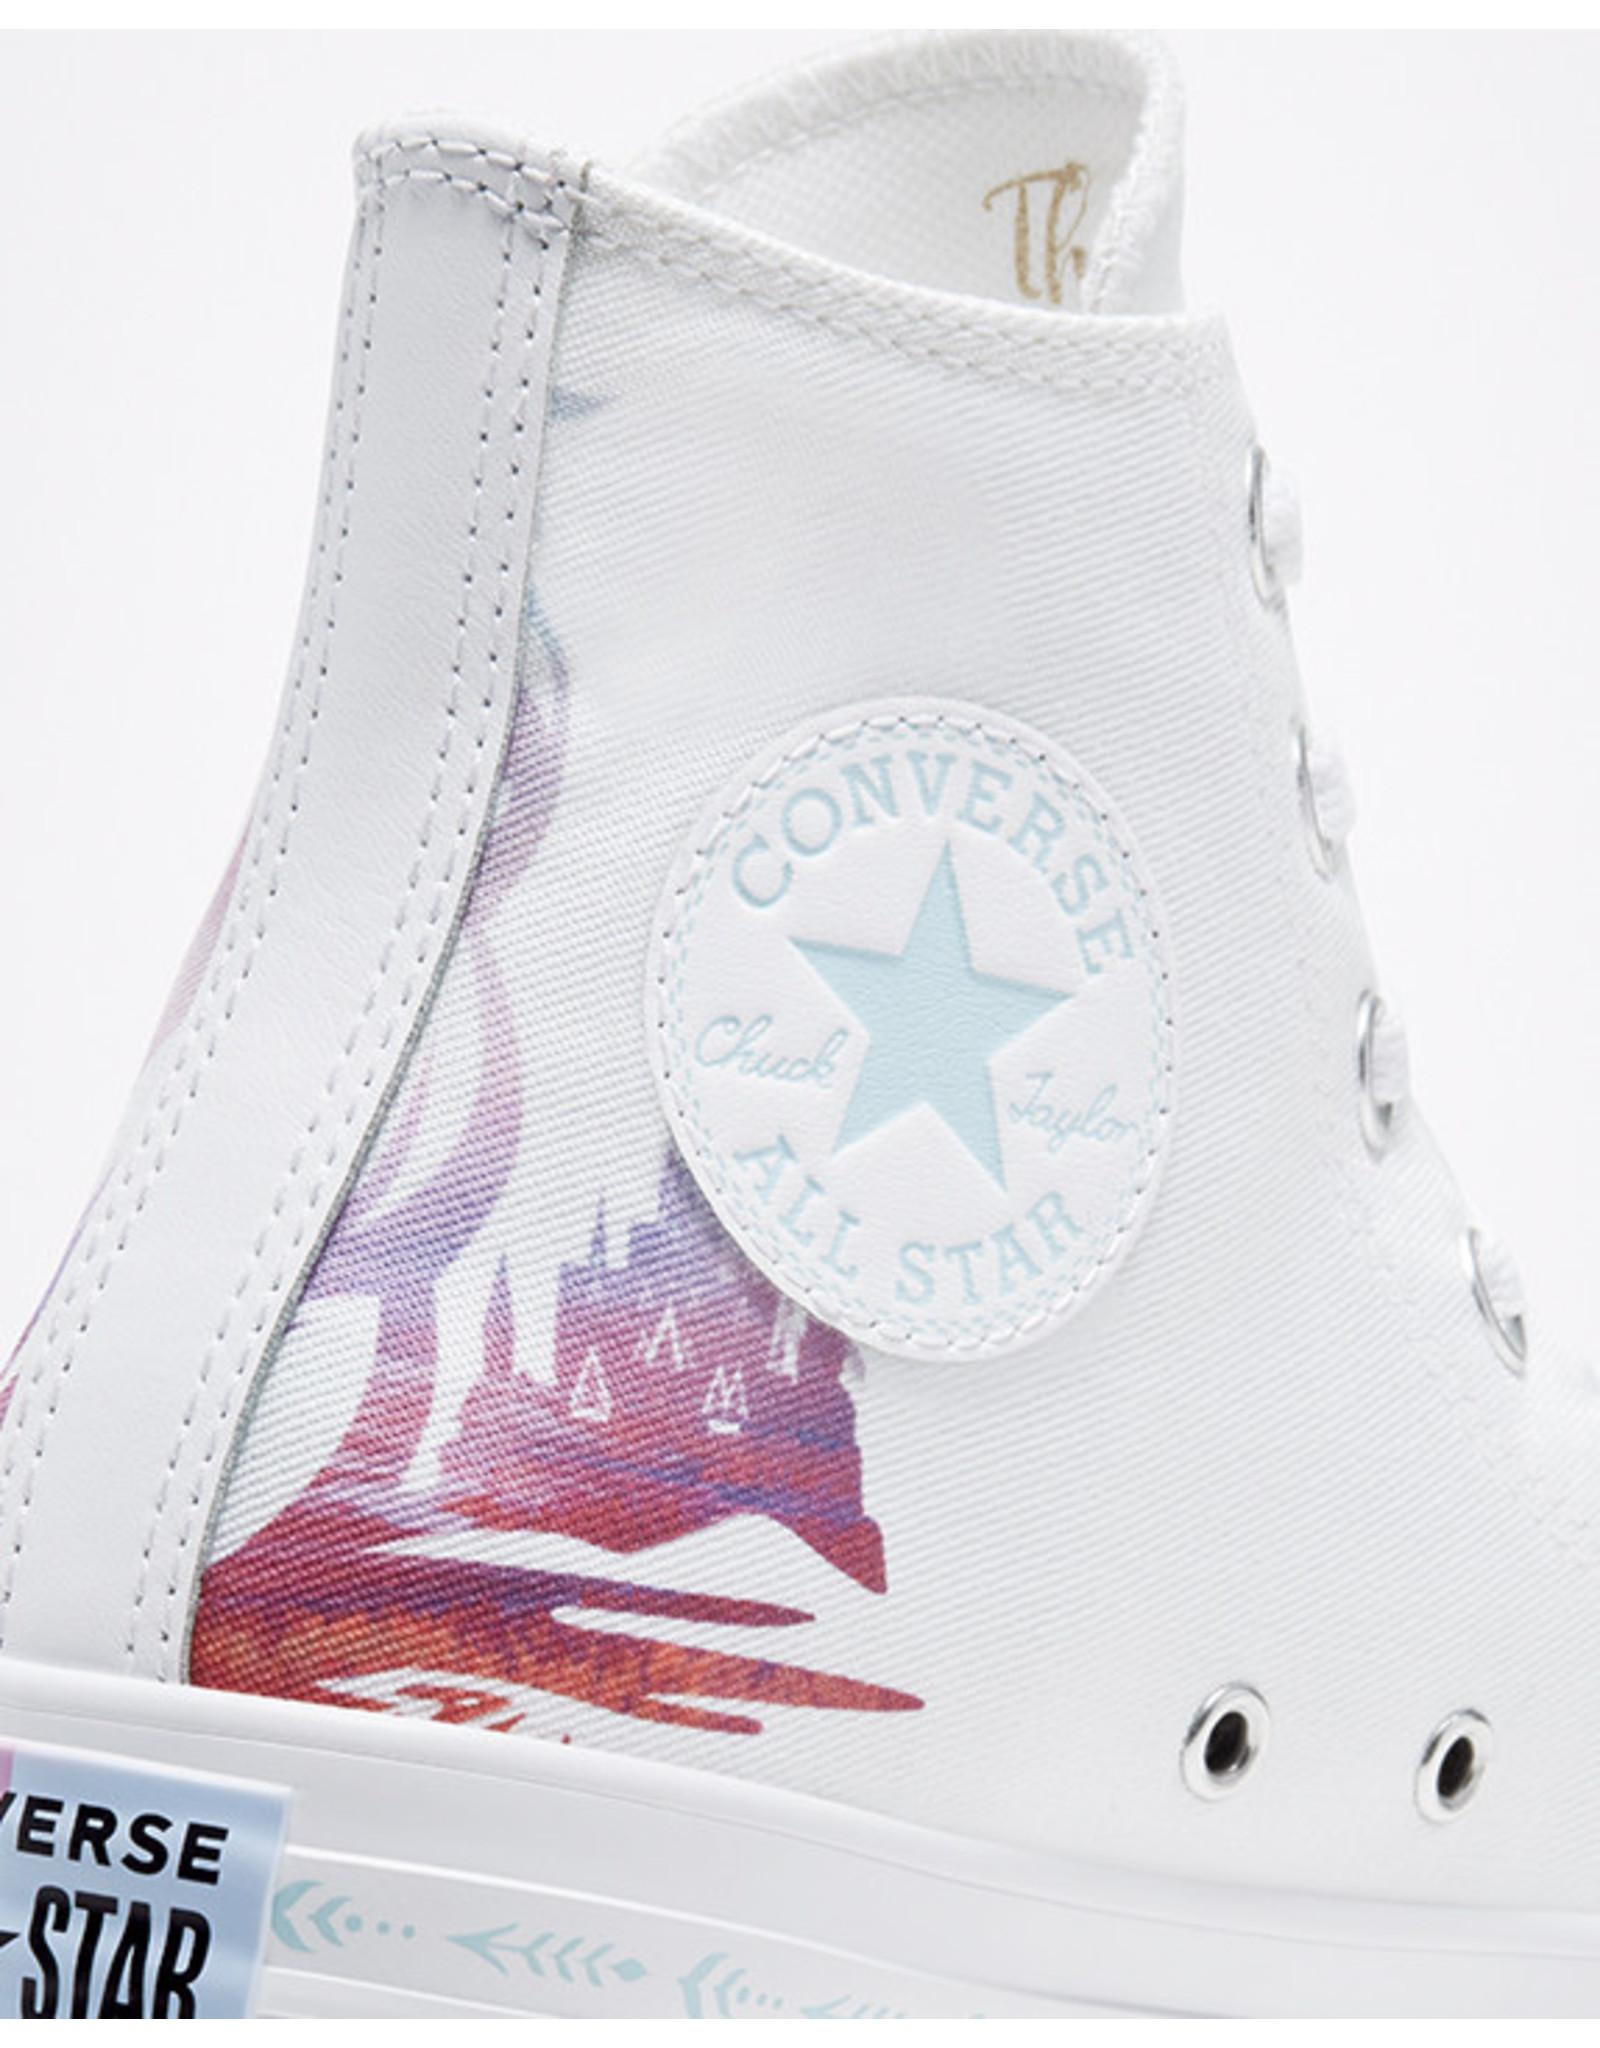 CONVERSE CHUCK TAYLOR ALL STAR HI FROZEN 2 WHITE/MULTI/WHITE C19FZM-167357C